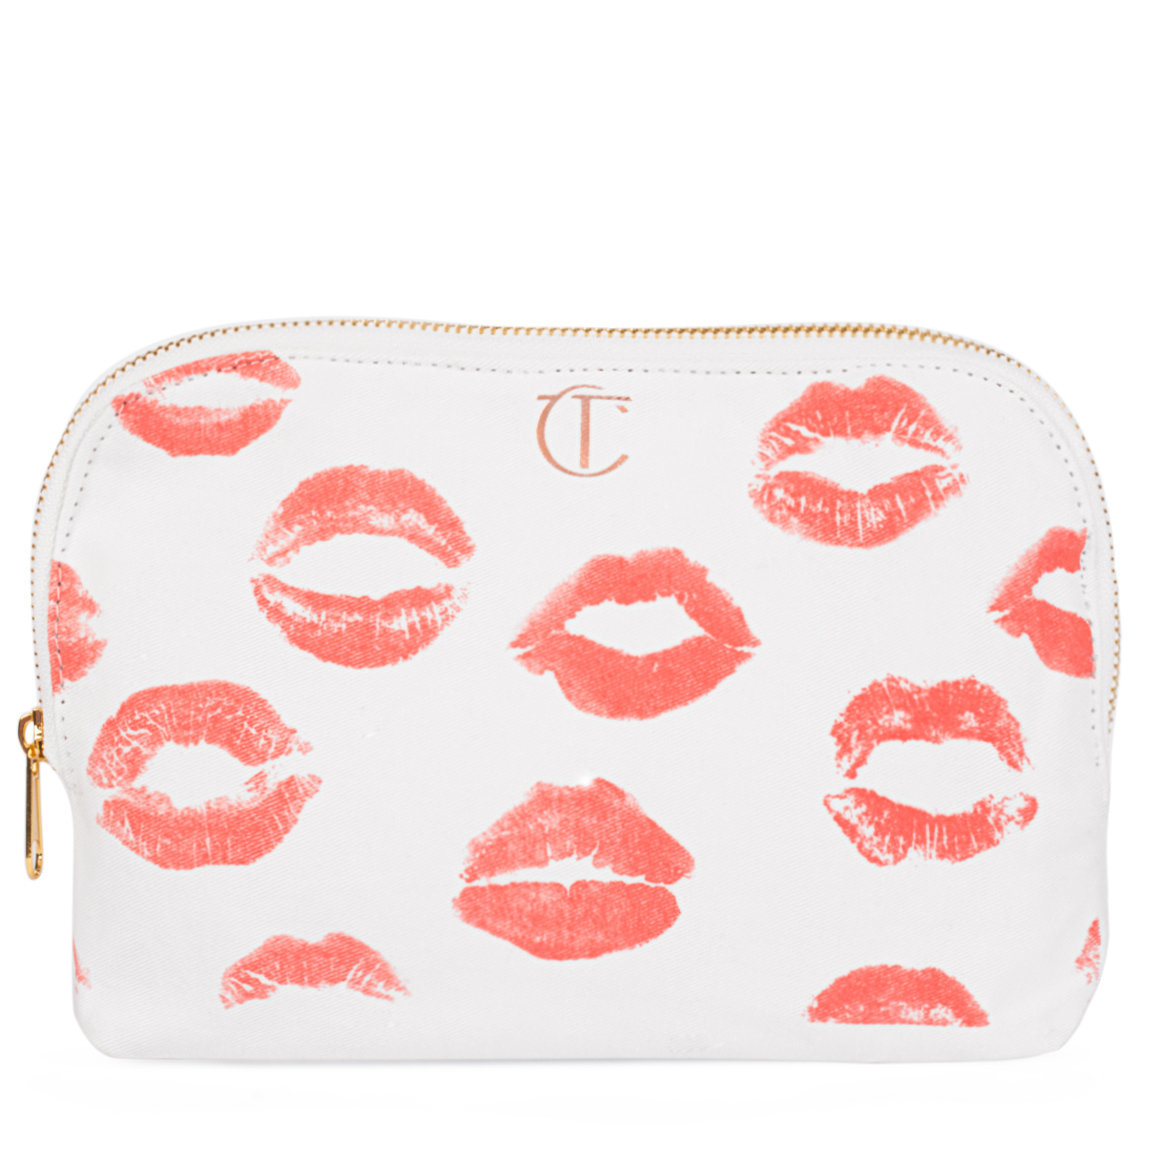 Charlotte Tilbury Makeup Bag product swatch.